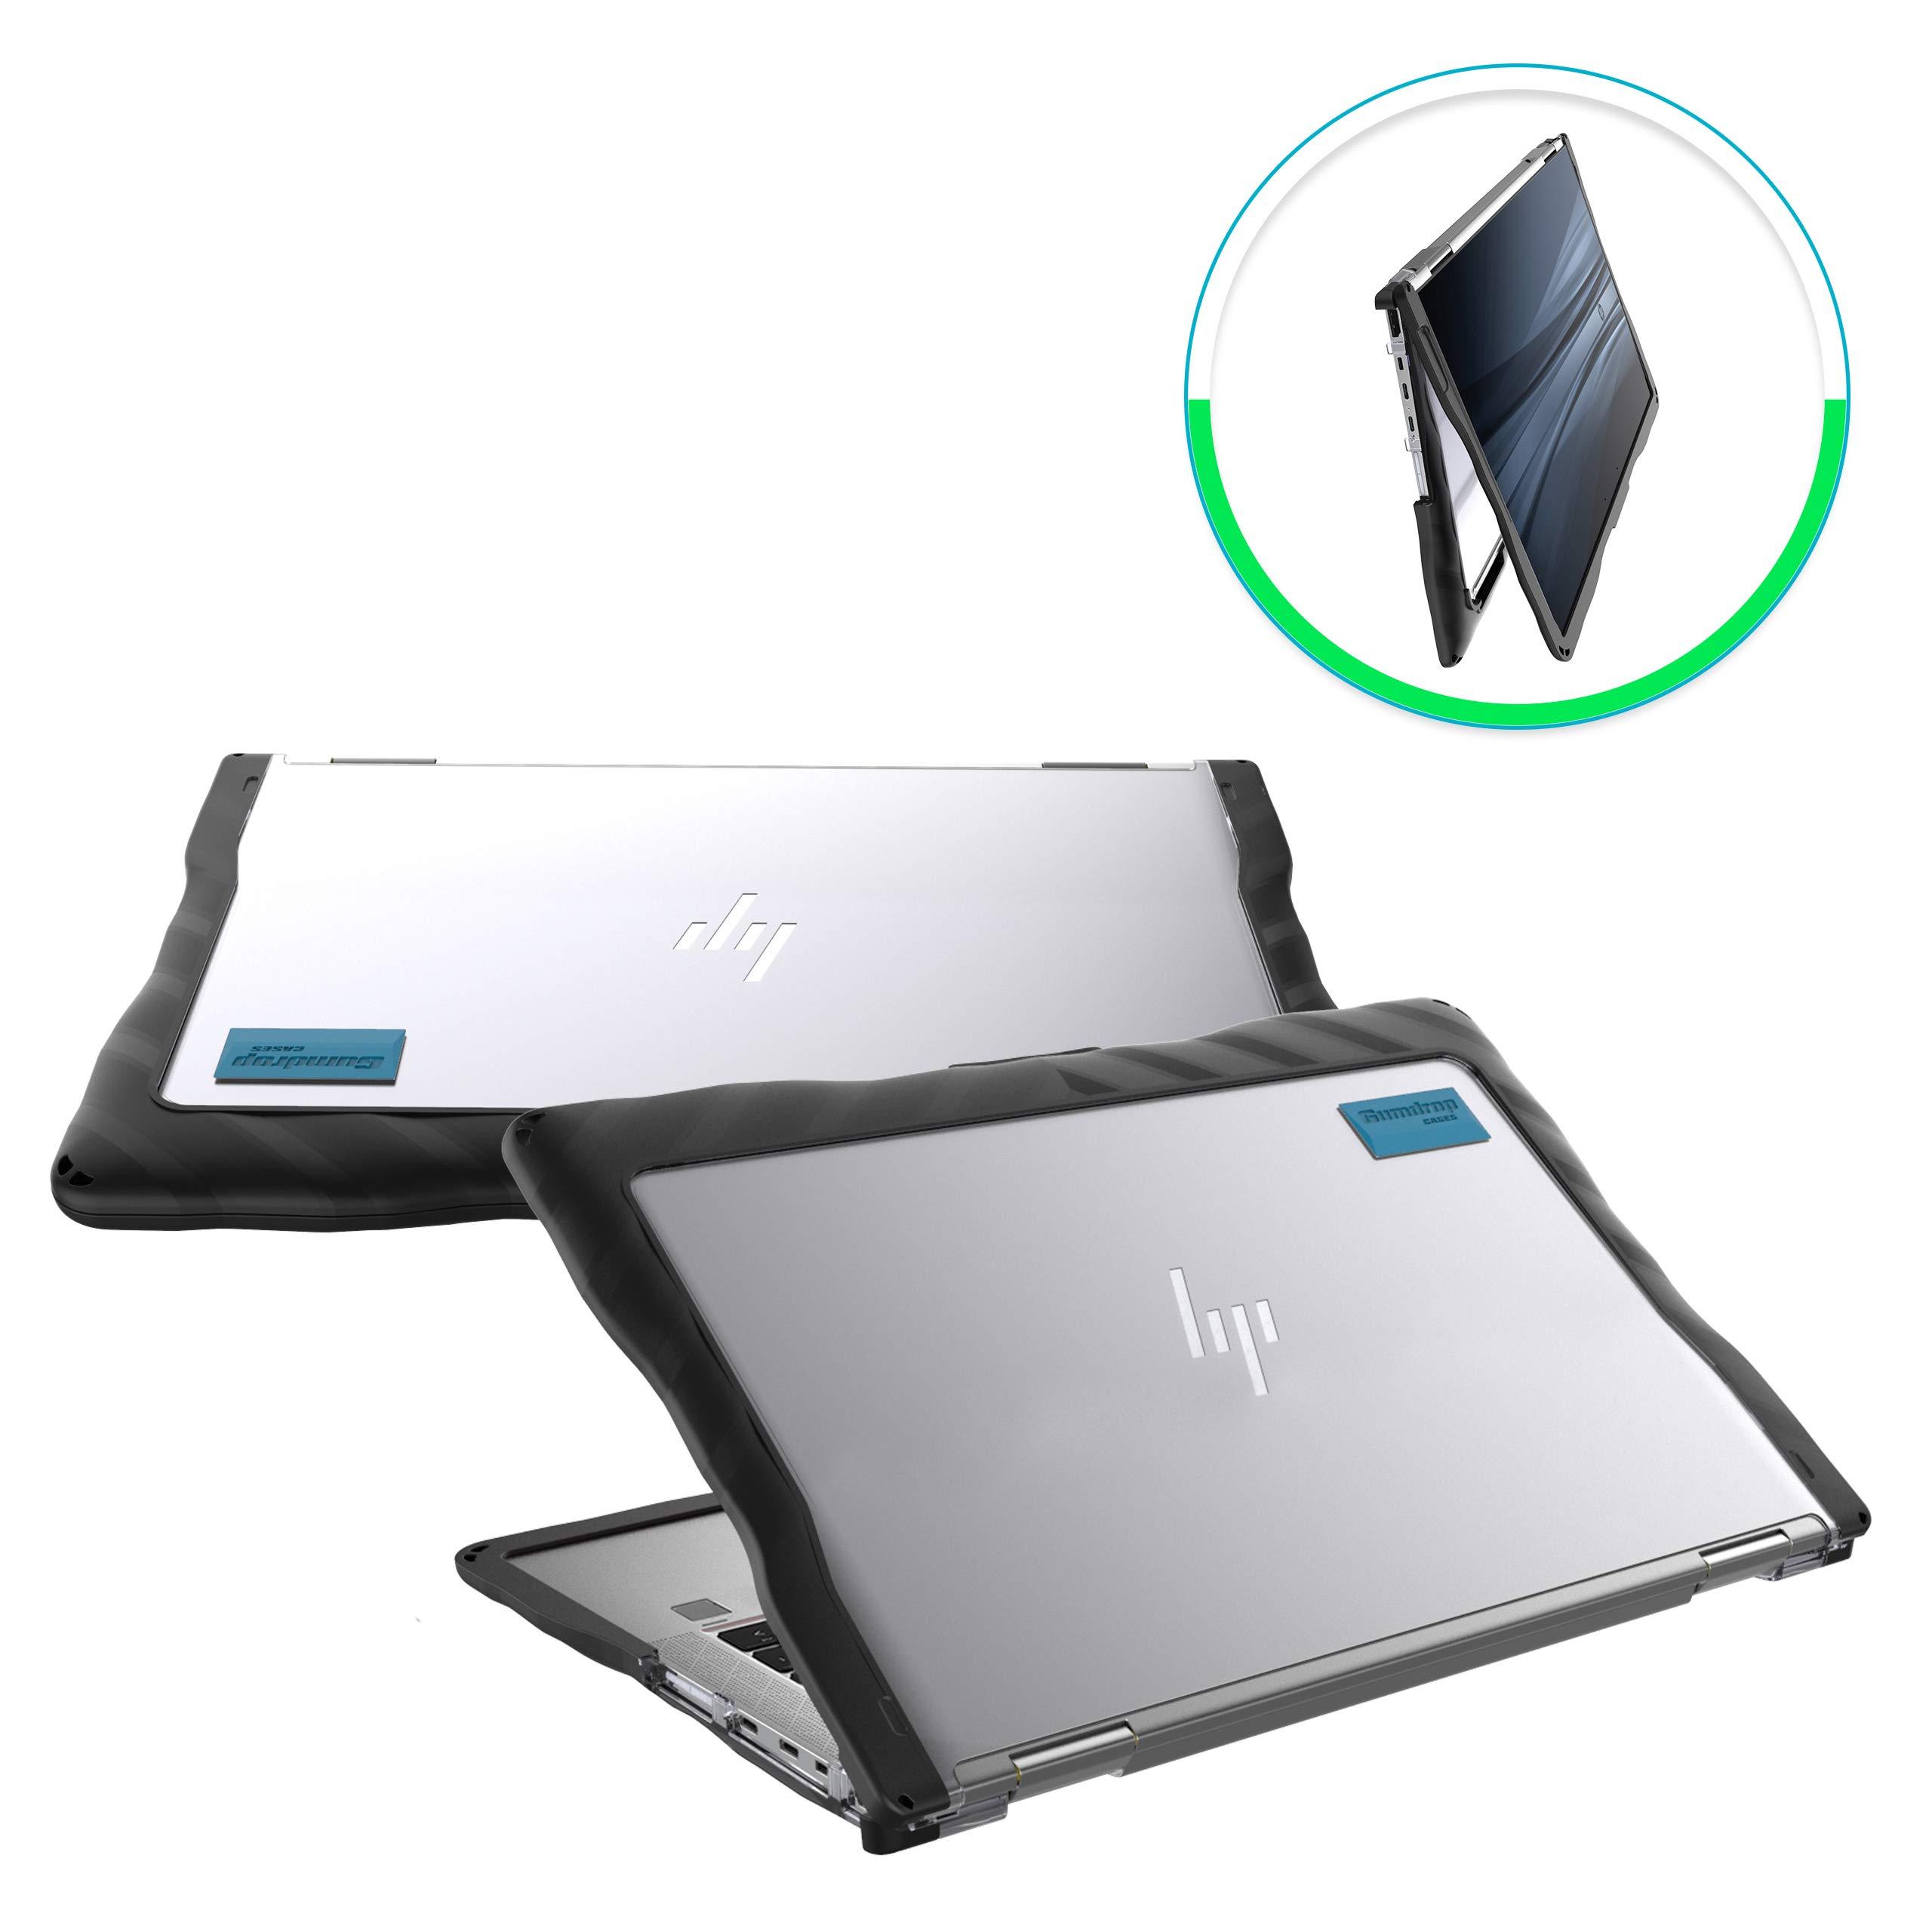 Gumdrop DropTech Case Designed for HP Elitebook x360 1030 G3 Laptop for K-12 Students, Teachers, Kids - Black, Rugged, Shock Absorbing, Extreme Drop Protection by GumDrop